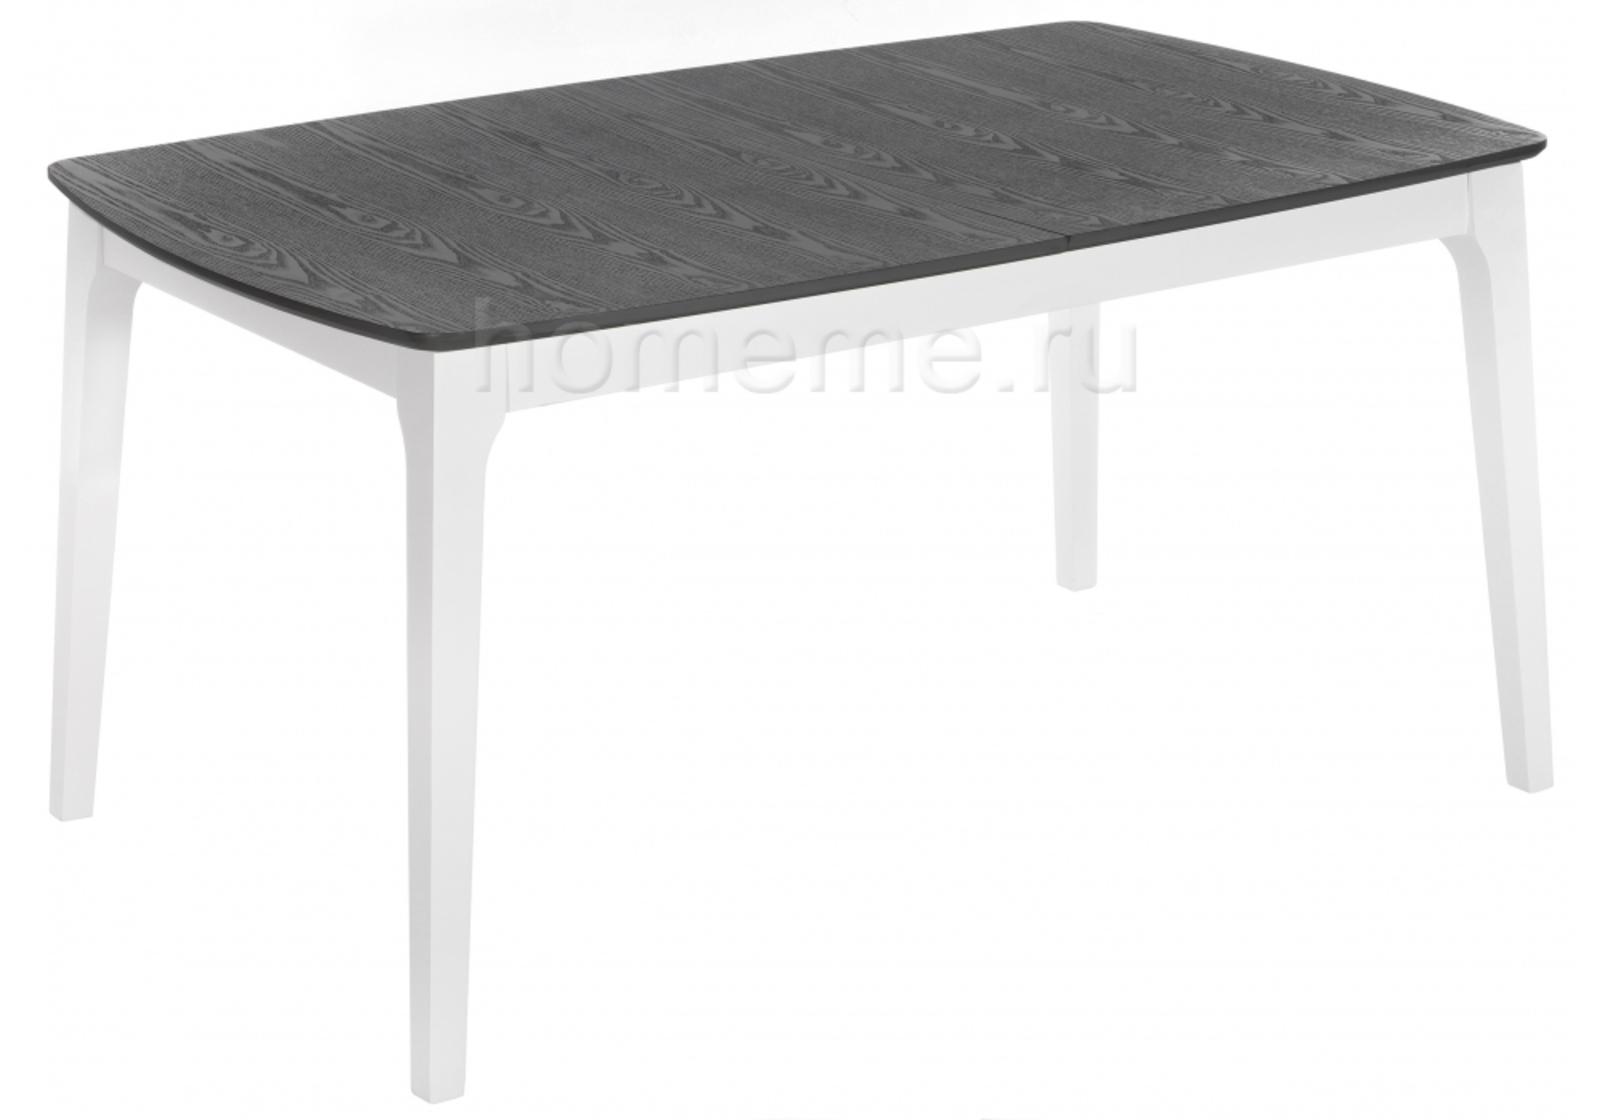 Стол деревянный Enzo серый / белый 11568 Enzo серый / белый 11568 (18285) фото